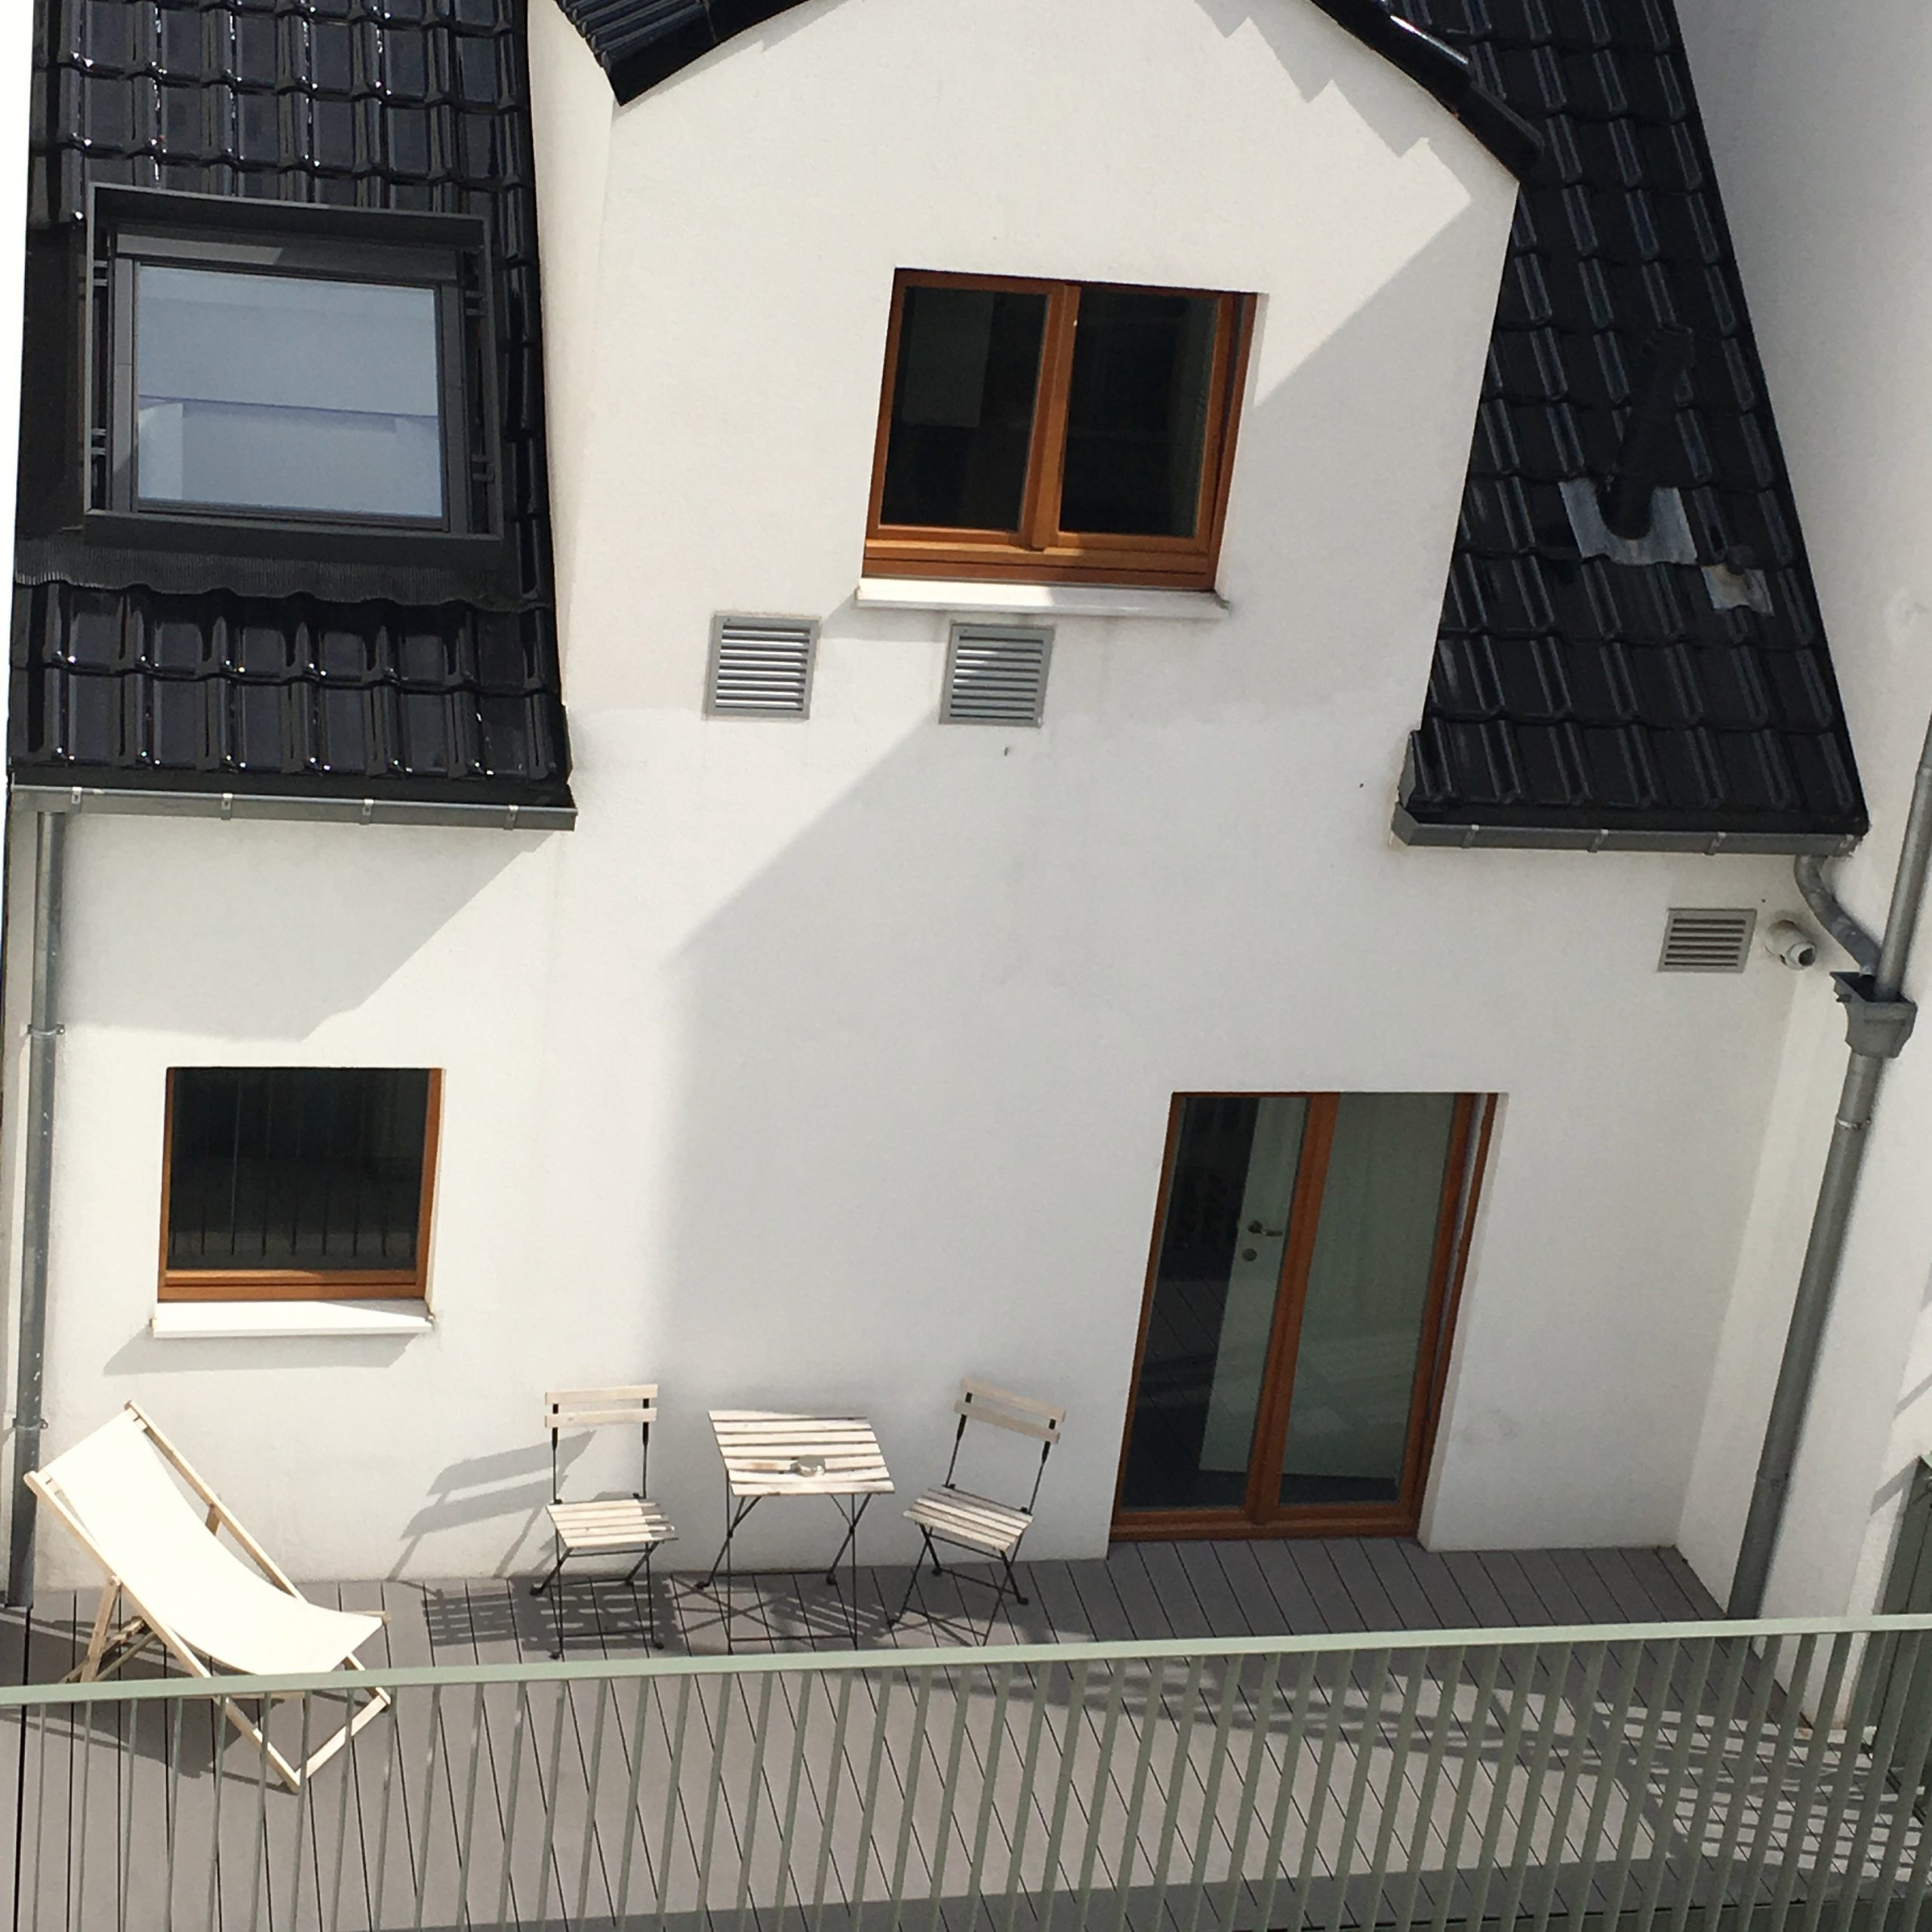 Brazil 3 - Furnished expat rental at 't Eilandje, Antwerp